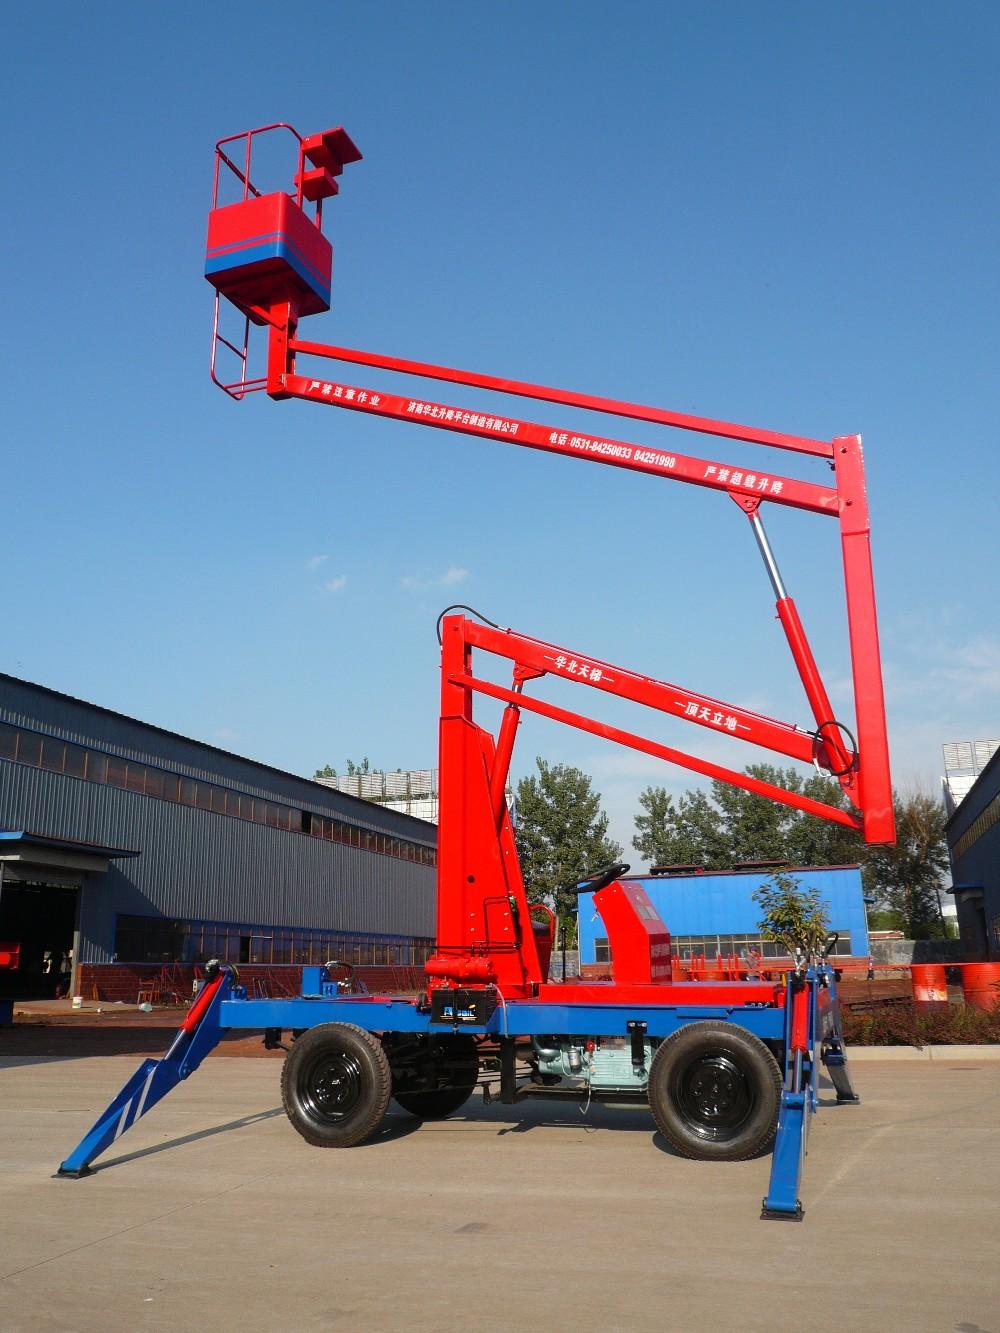 Heavy Duty Hydraulic Lifts : Hydraulic mobile heavy duty truck lifts buy